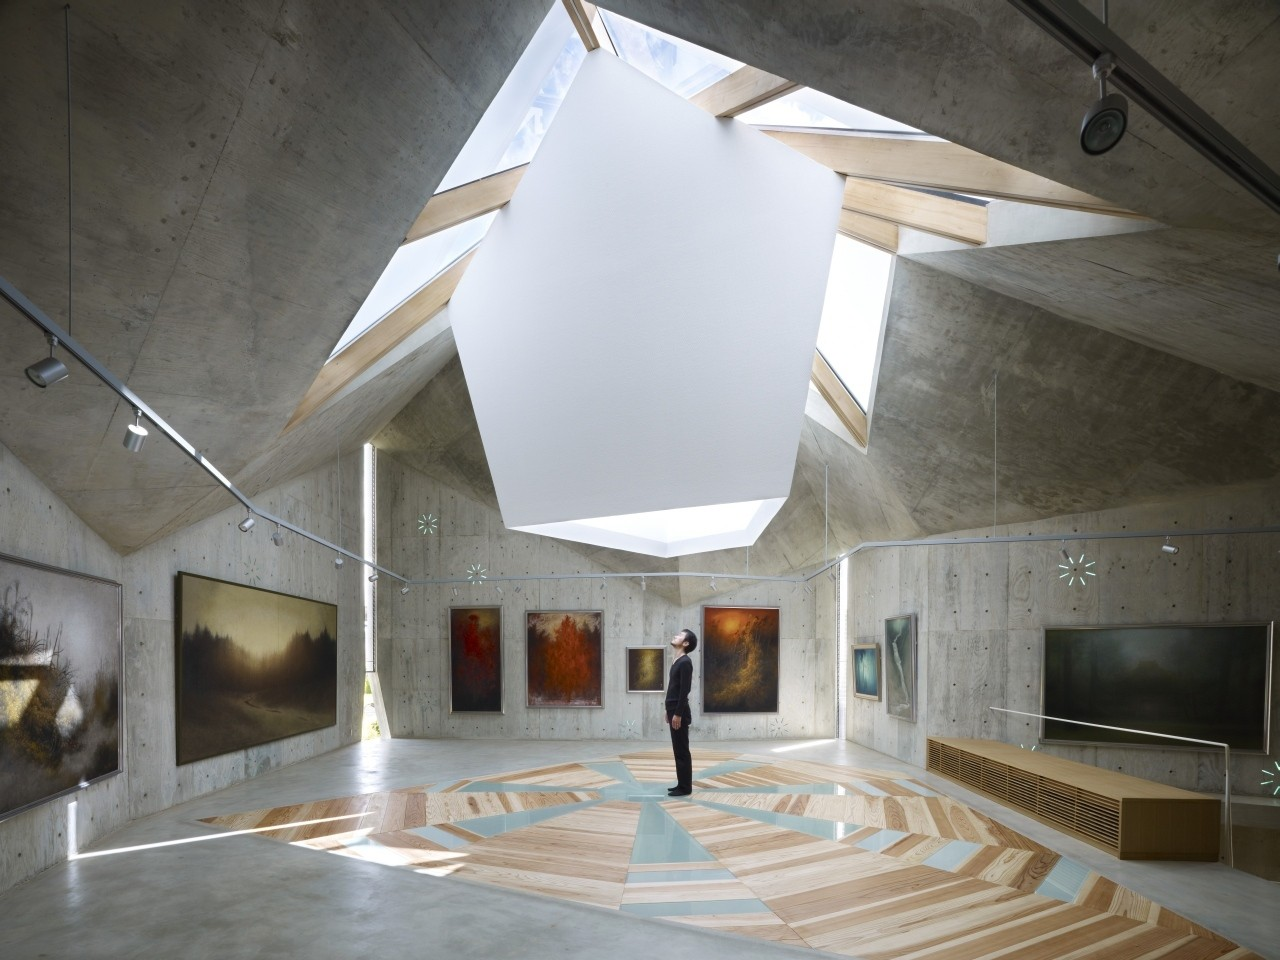 Mecenat Art Museum Naf Architect & Design - 12